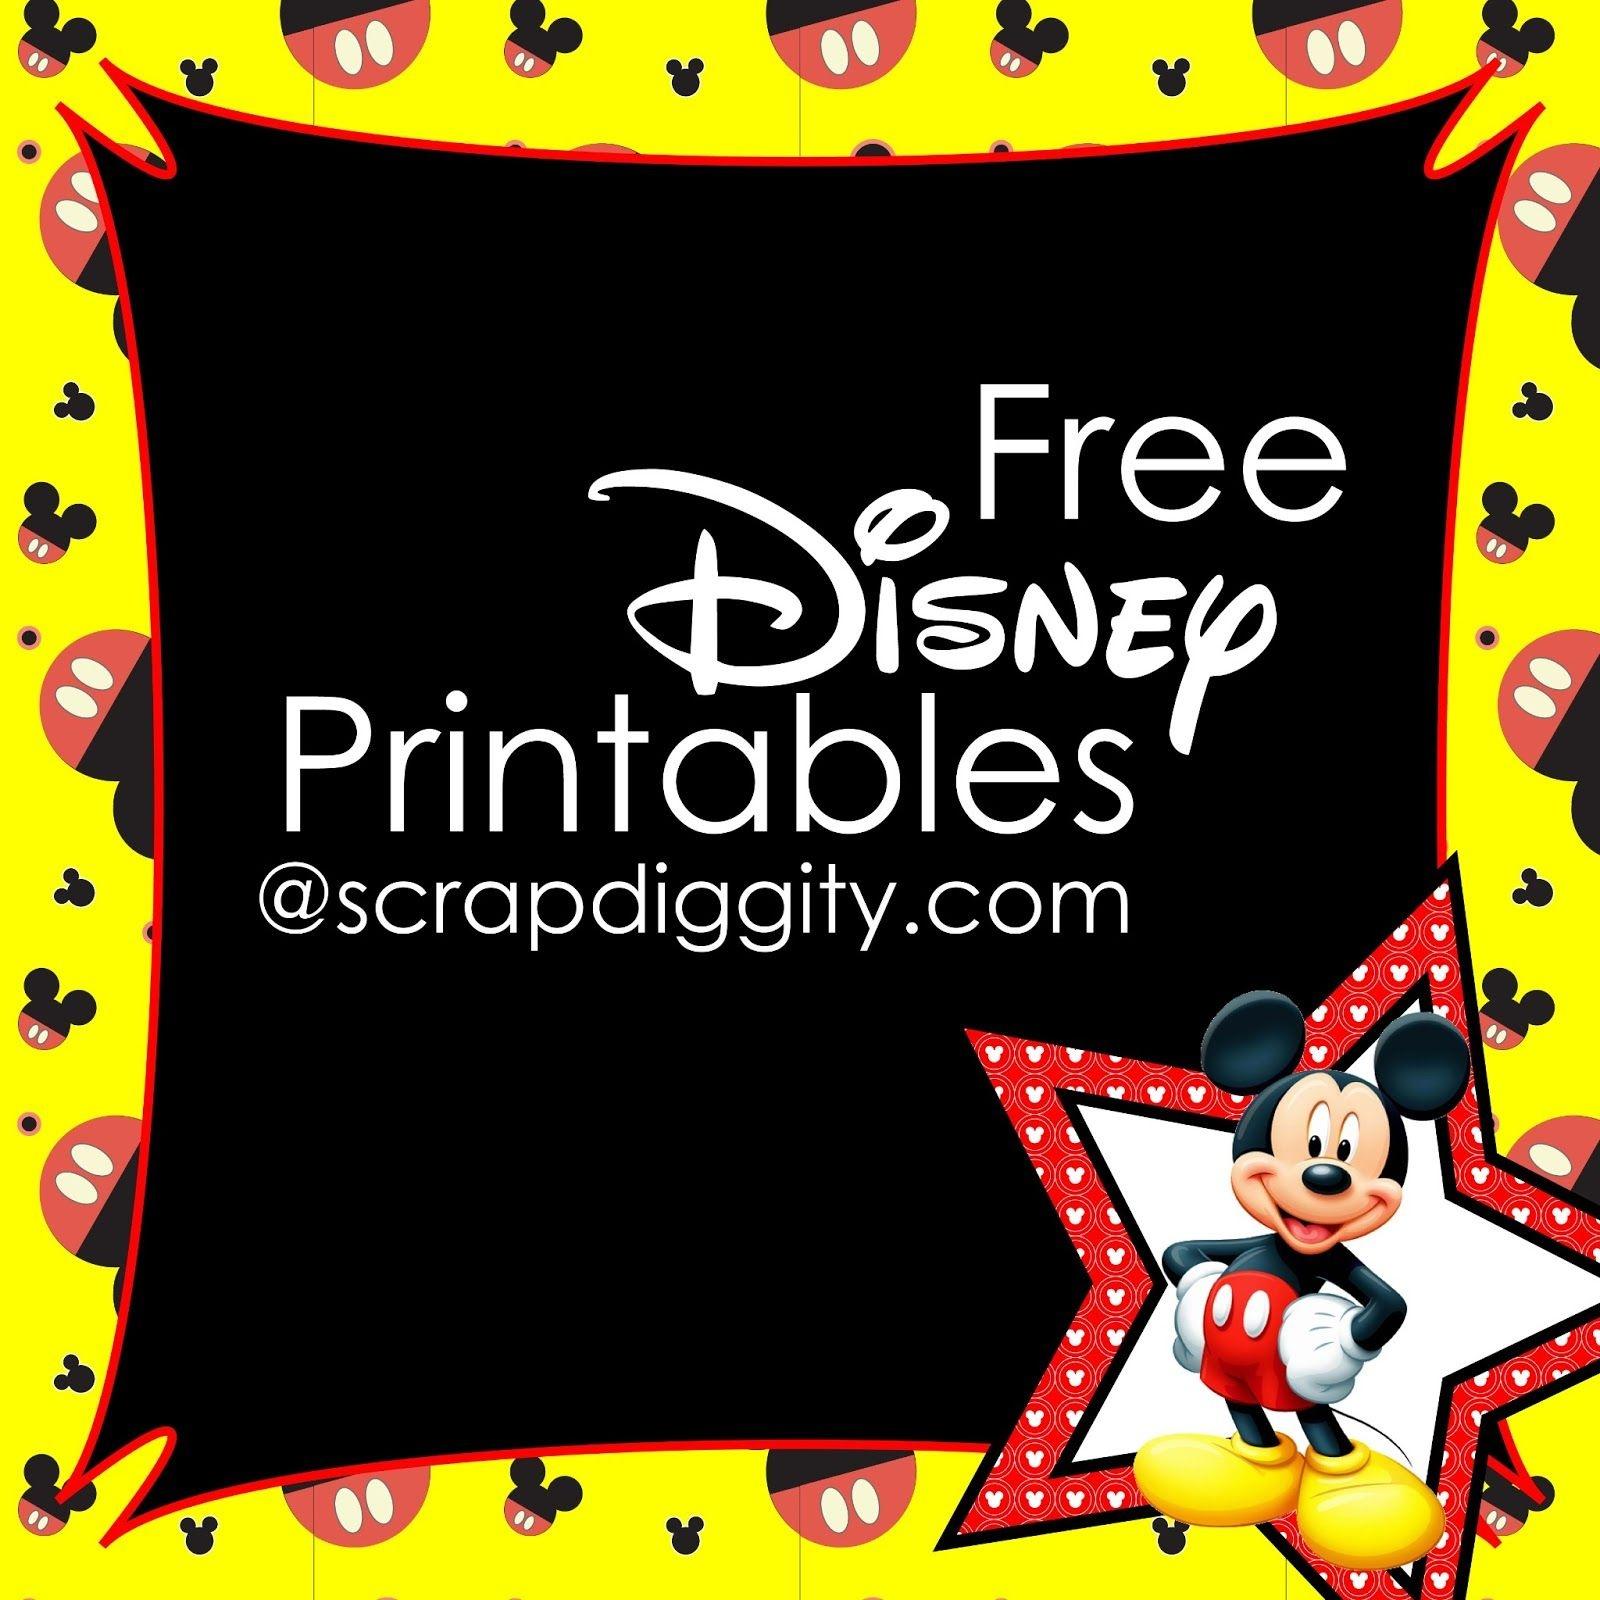 Scrapdiggity Free Disney Printables!-Great For The Classroom - Free Disney Printables